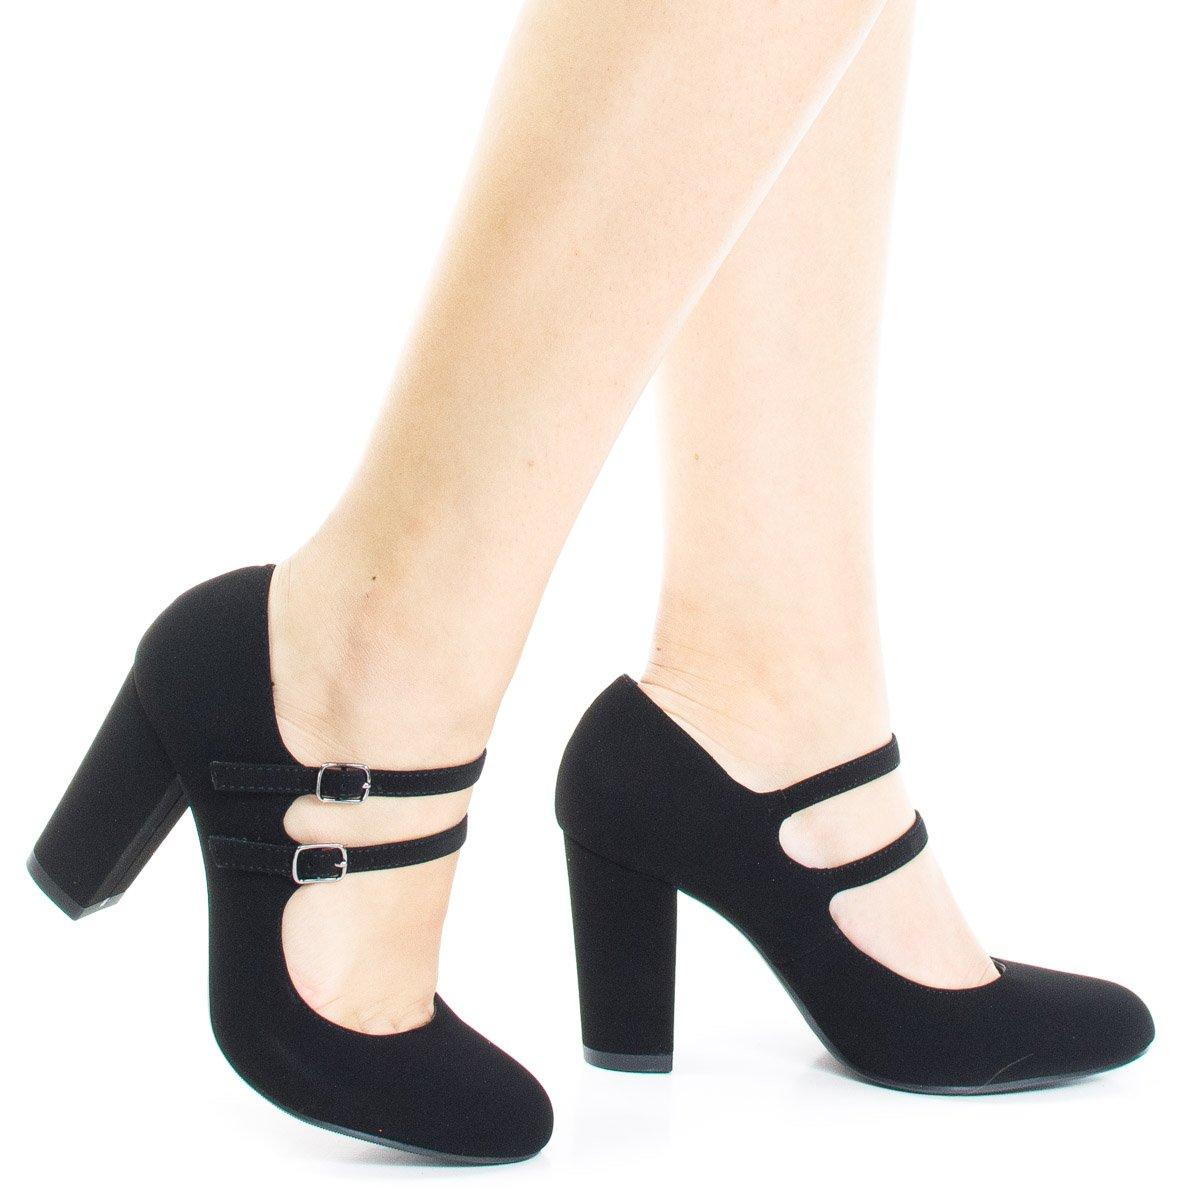 City Classified Comfort Padded Insole Double Buckle Mary Jane Dress Pump, Chunky Block Heel,10 B(M) US,Black